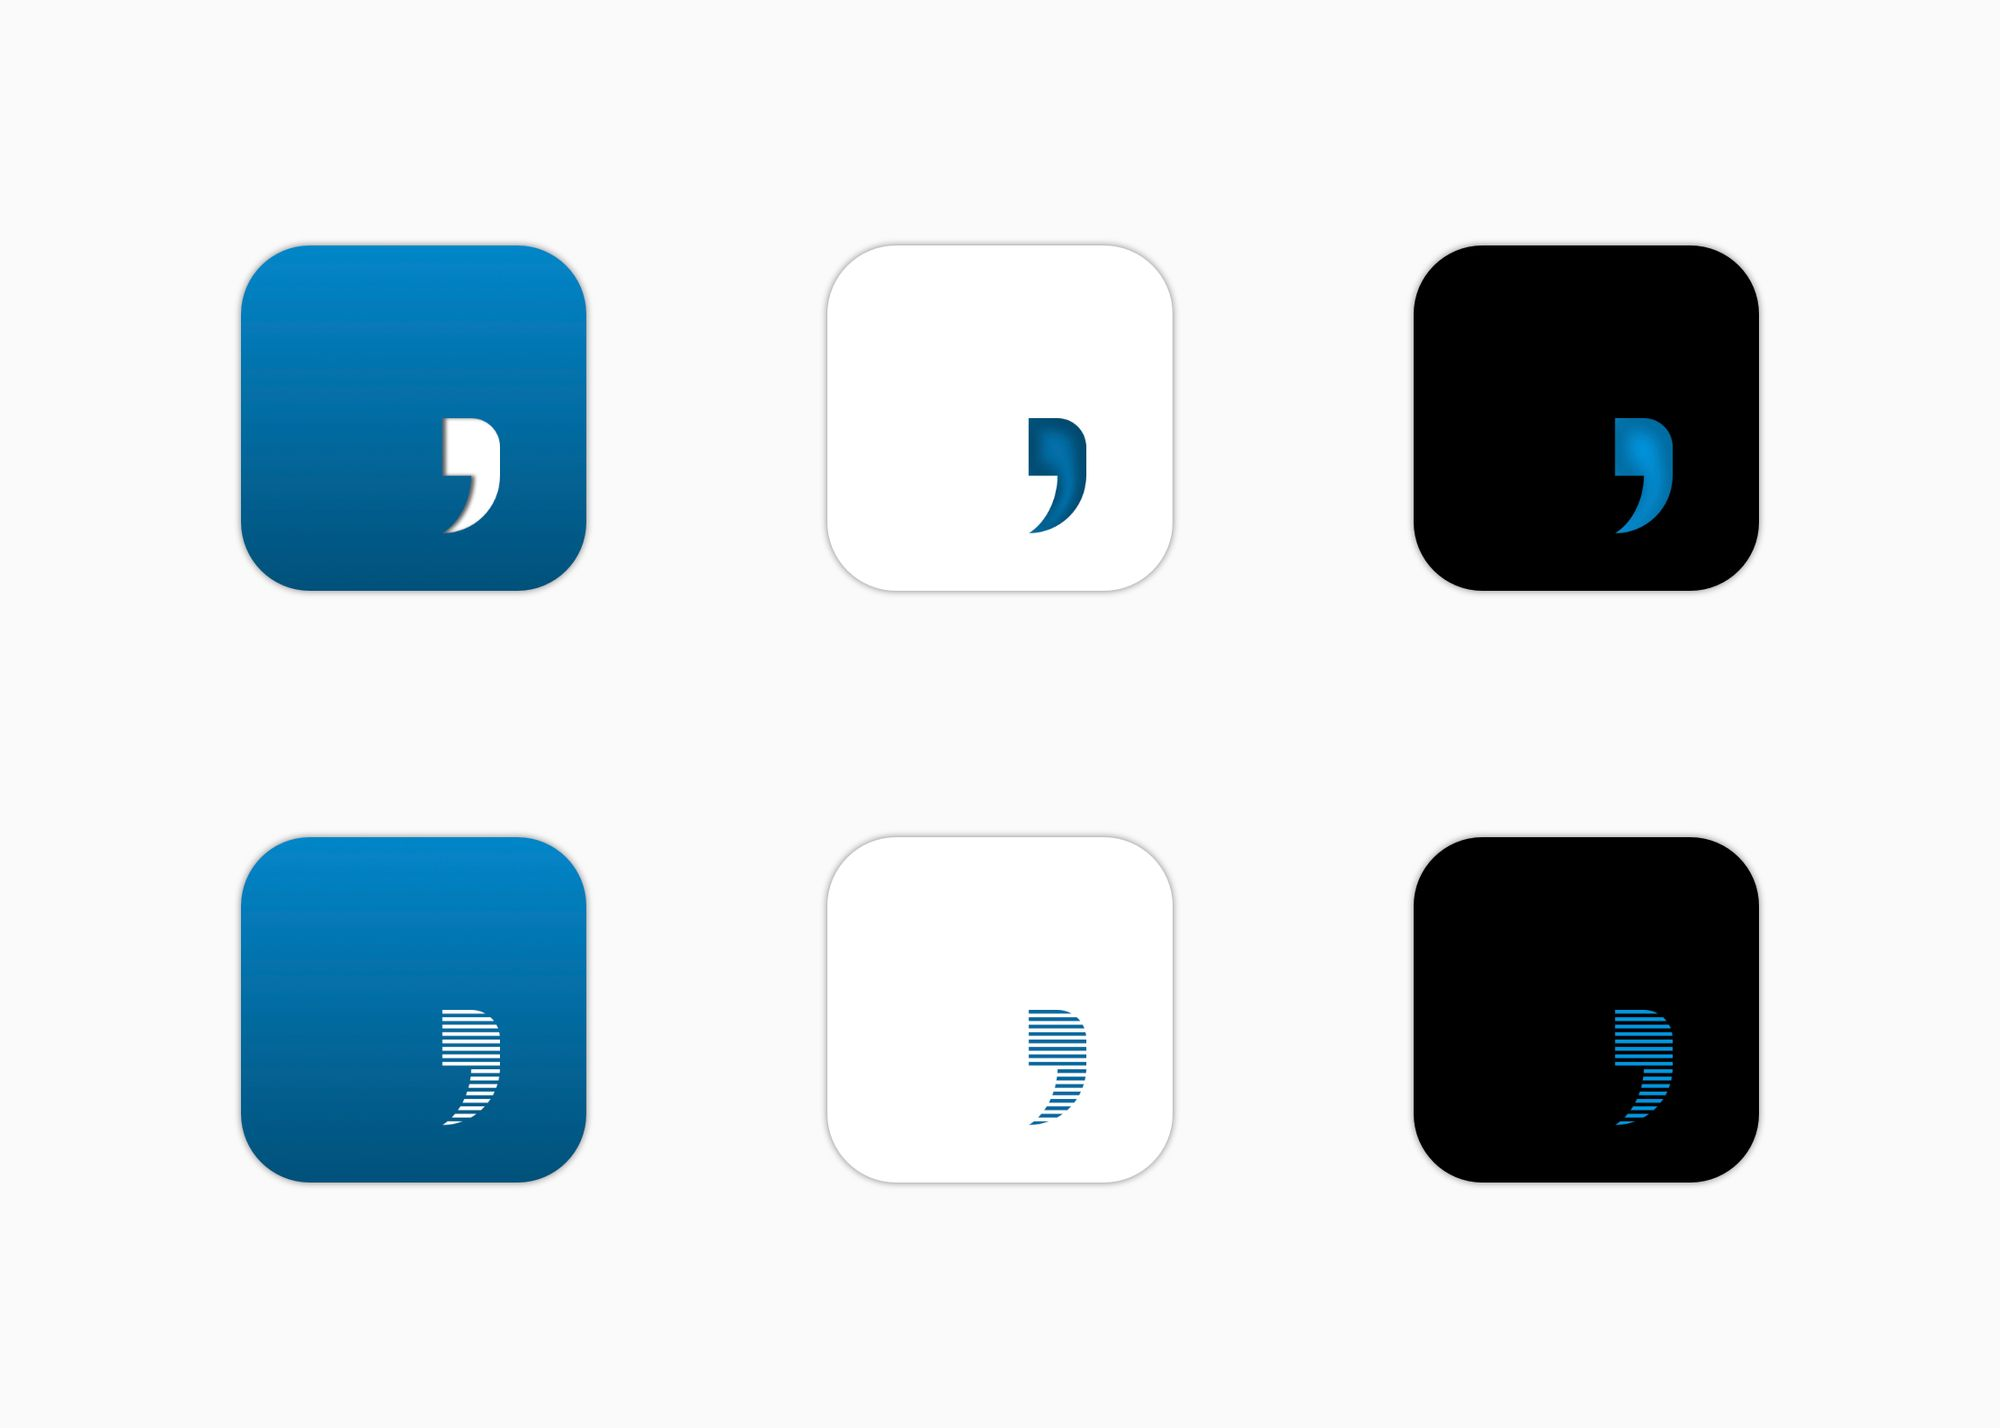 Six new Hibi Journal icons